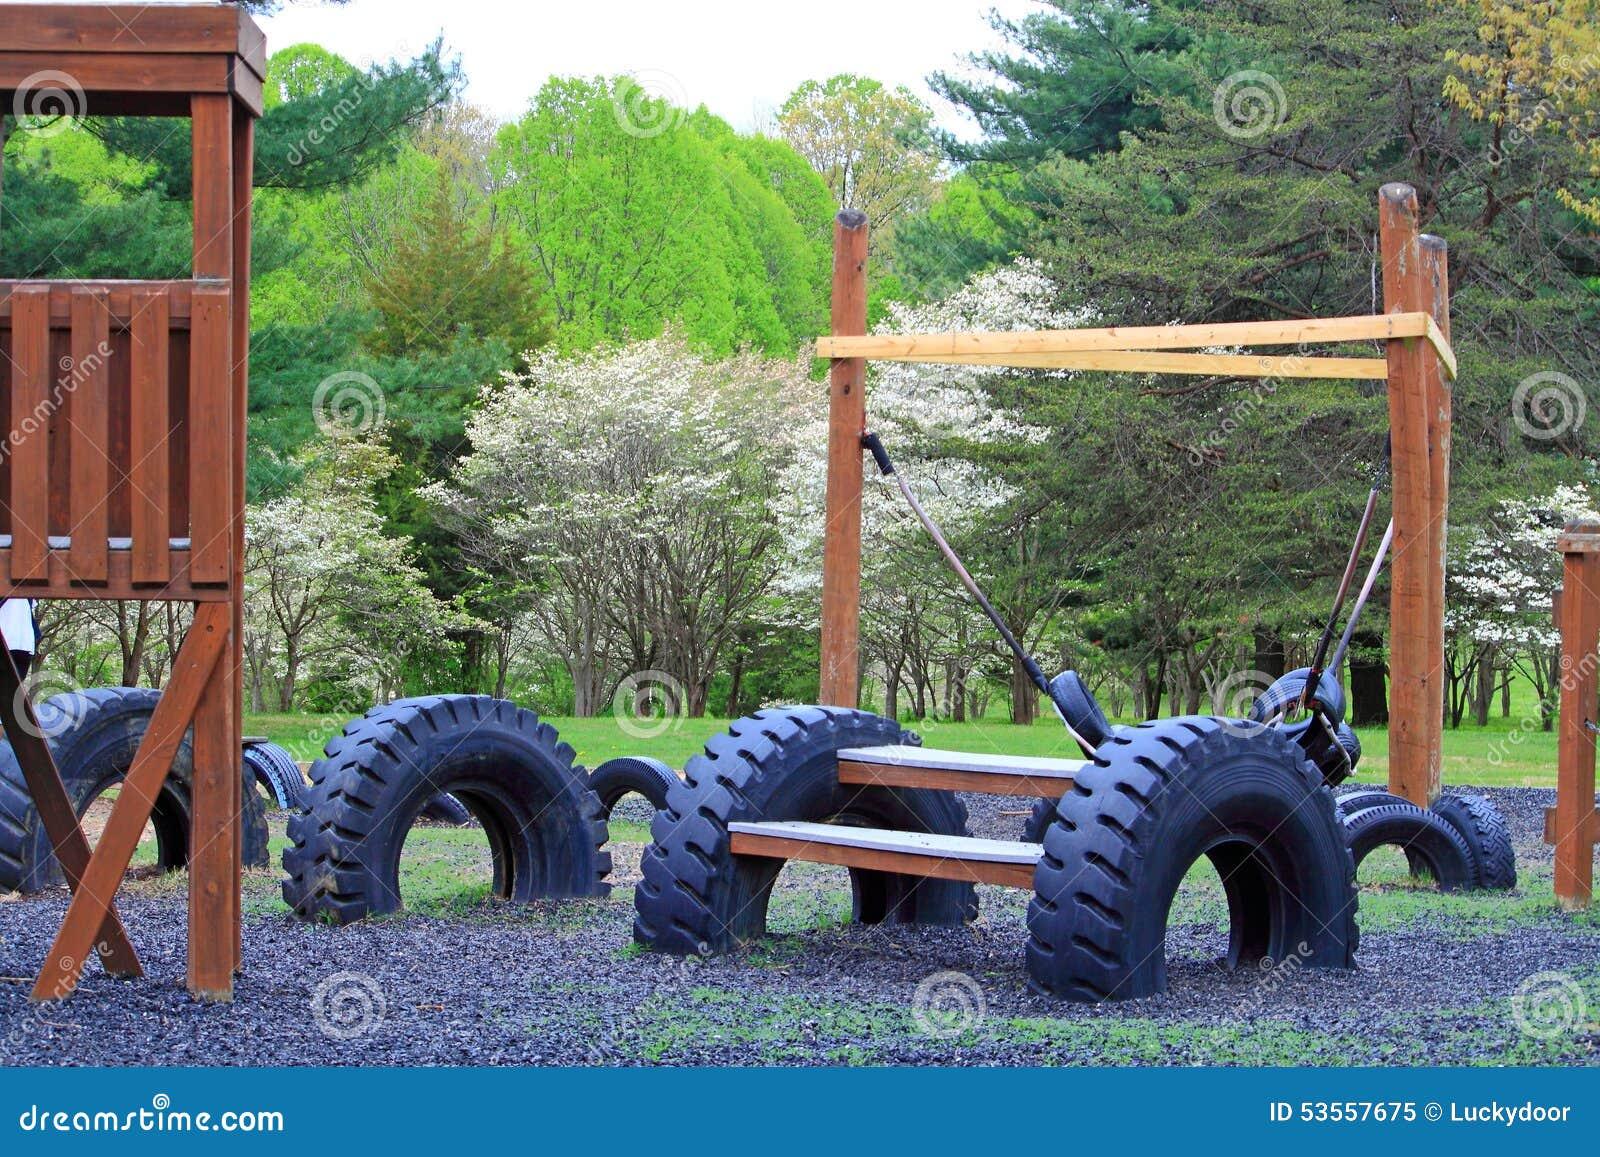 Recycle Tires Playground Stock Photo Image 53557675